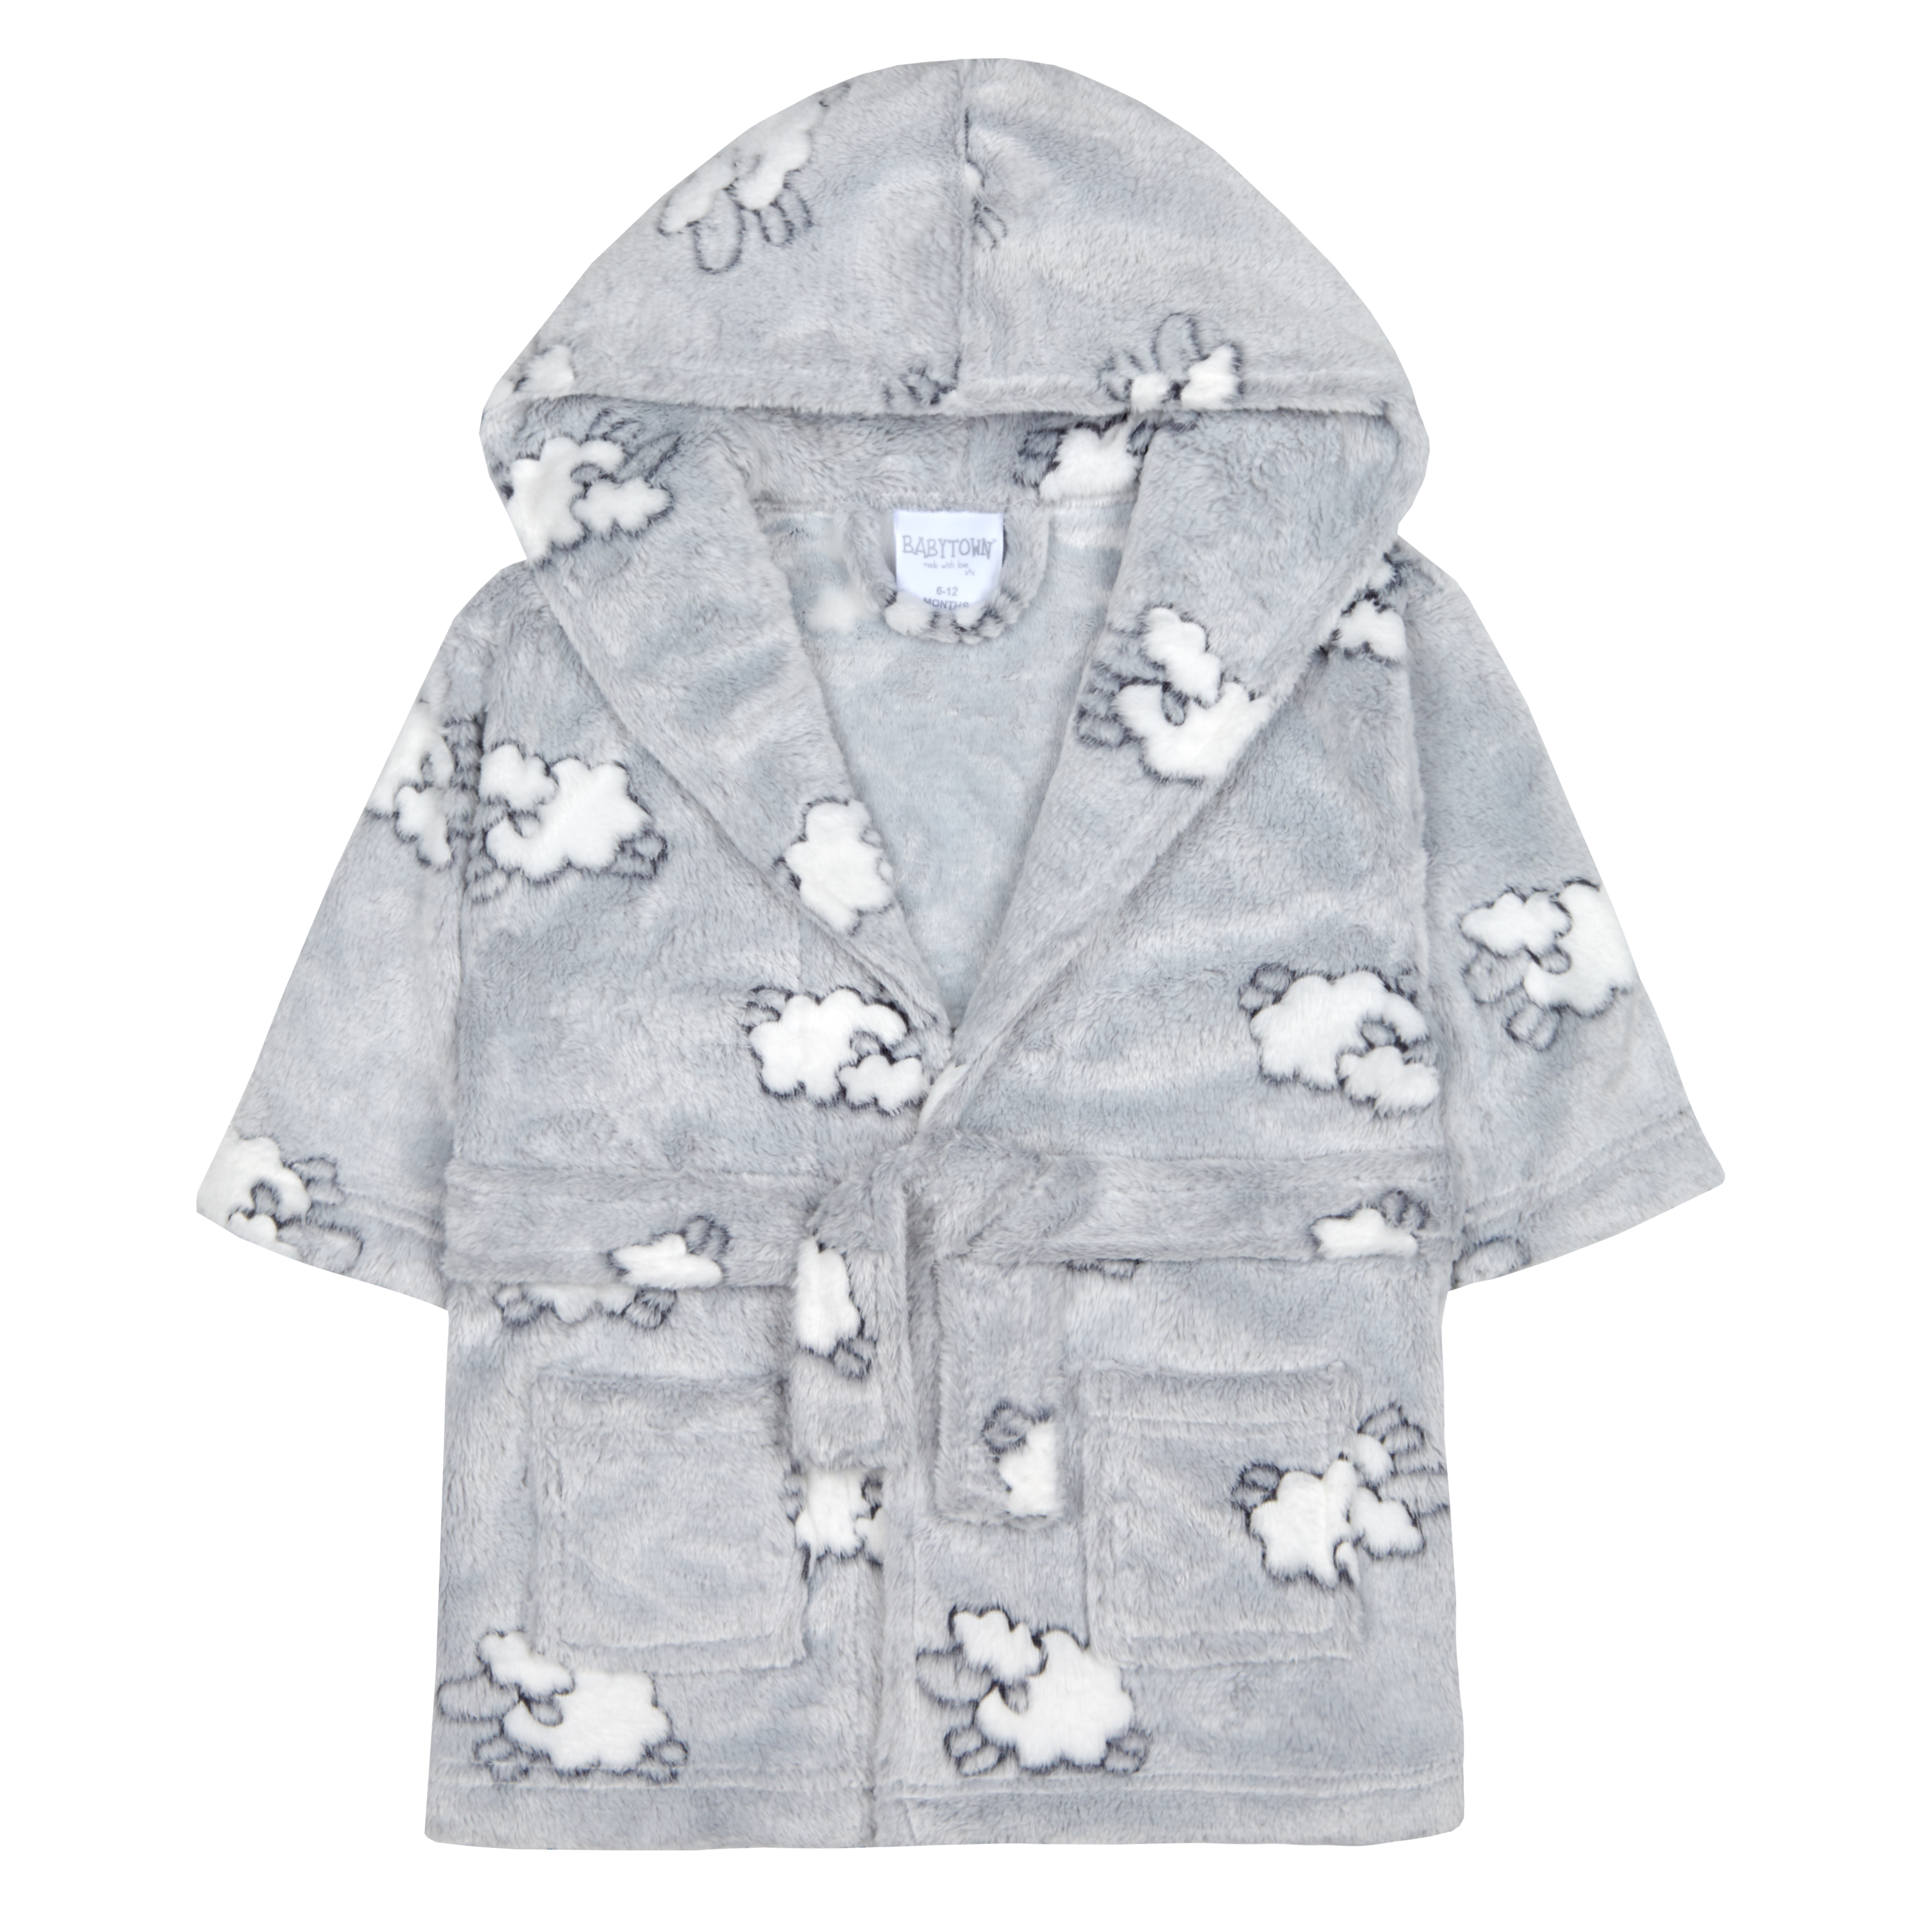 Baby Girls /& Boys Lamb Sheep Dressing Gown Robe Animal Plush Fleece Unisex